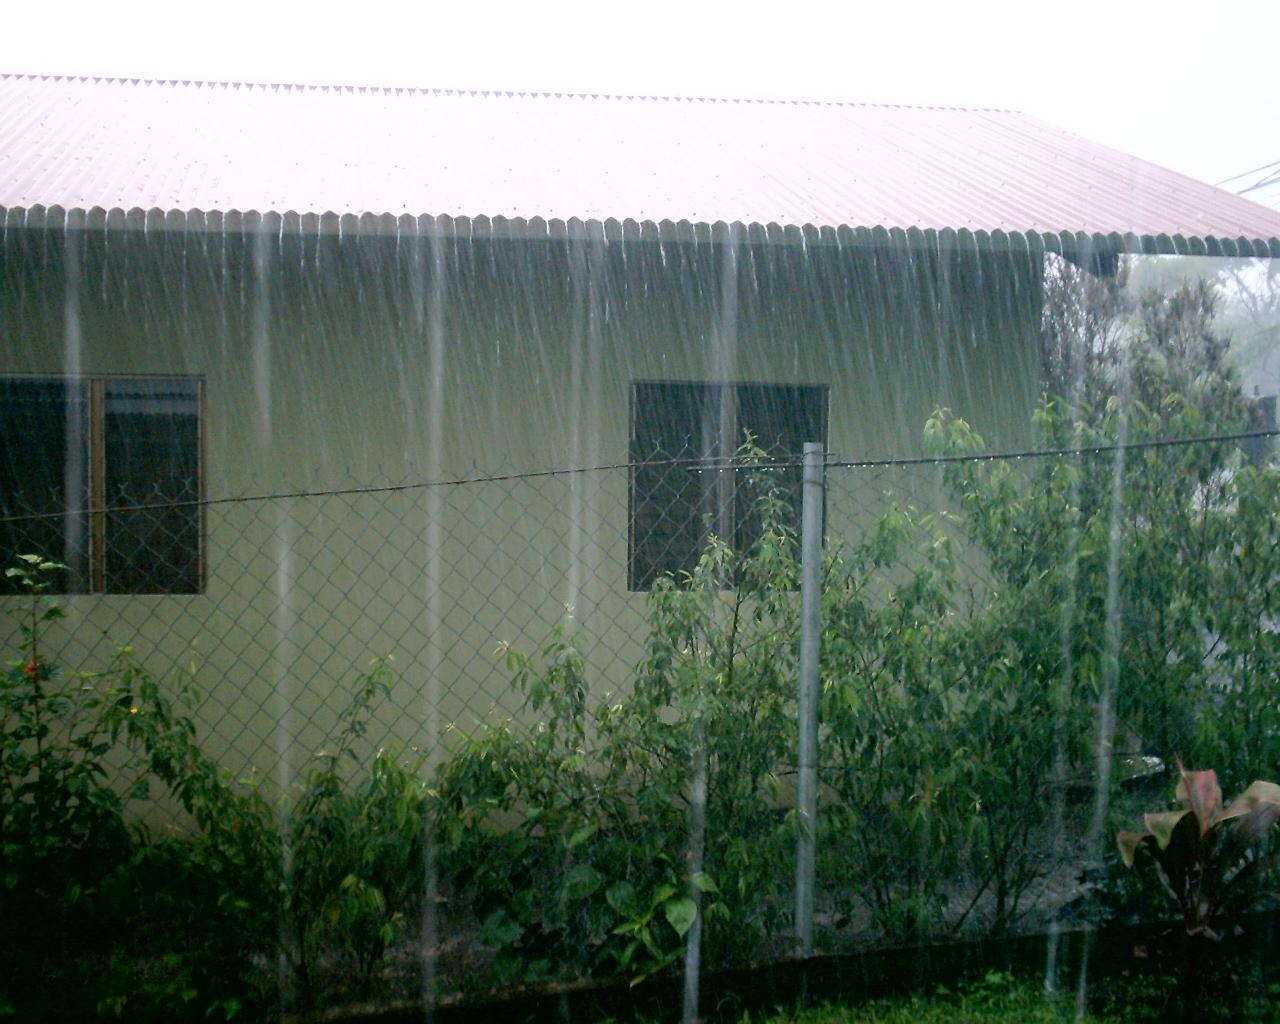 Panama Prattle Raining Bathtubs And Garbage